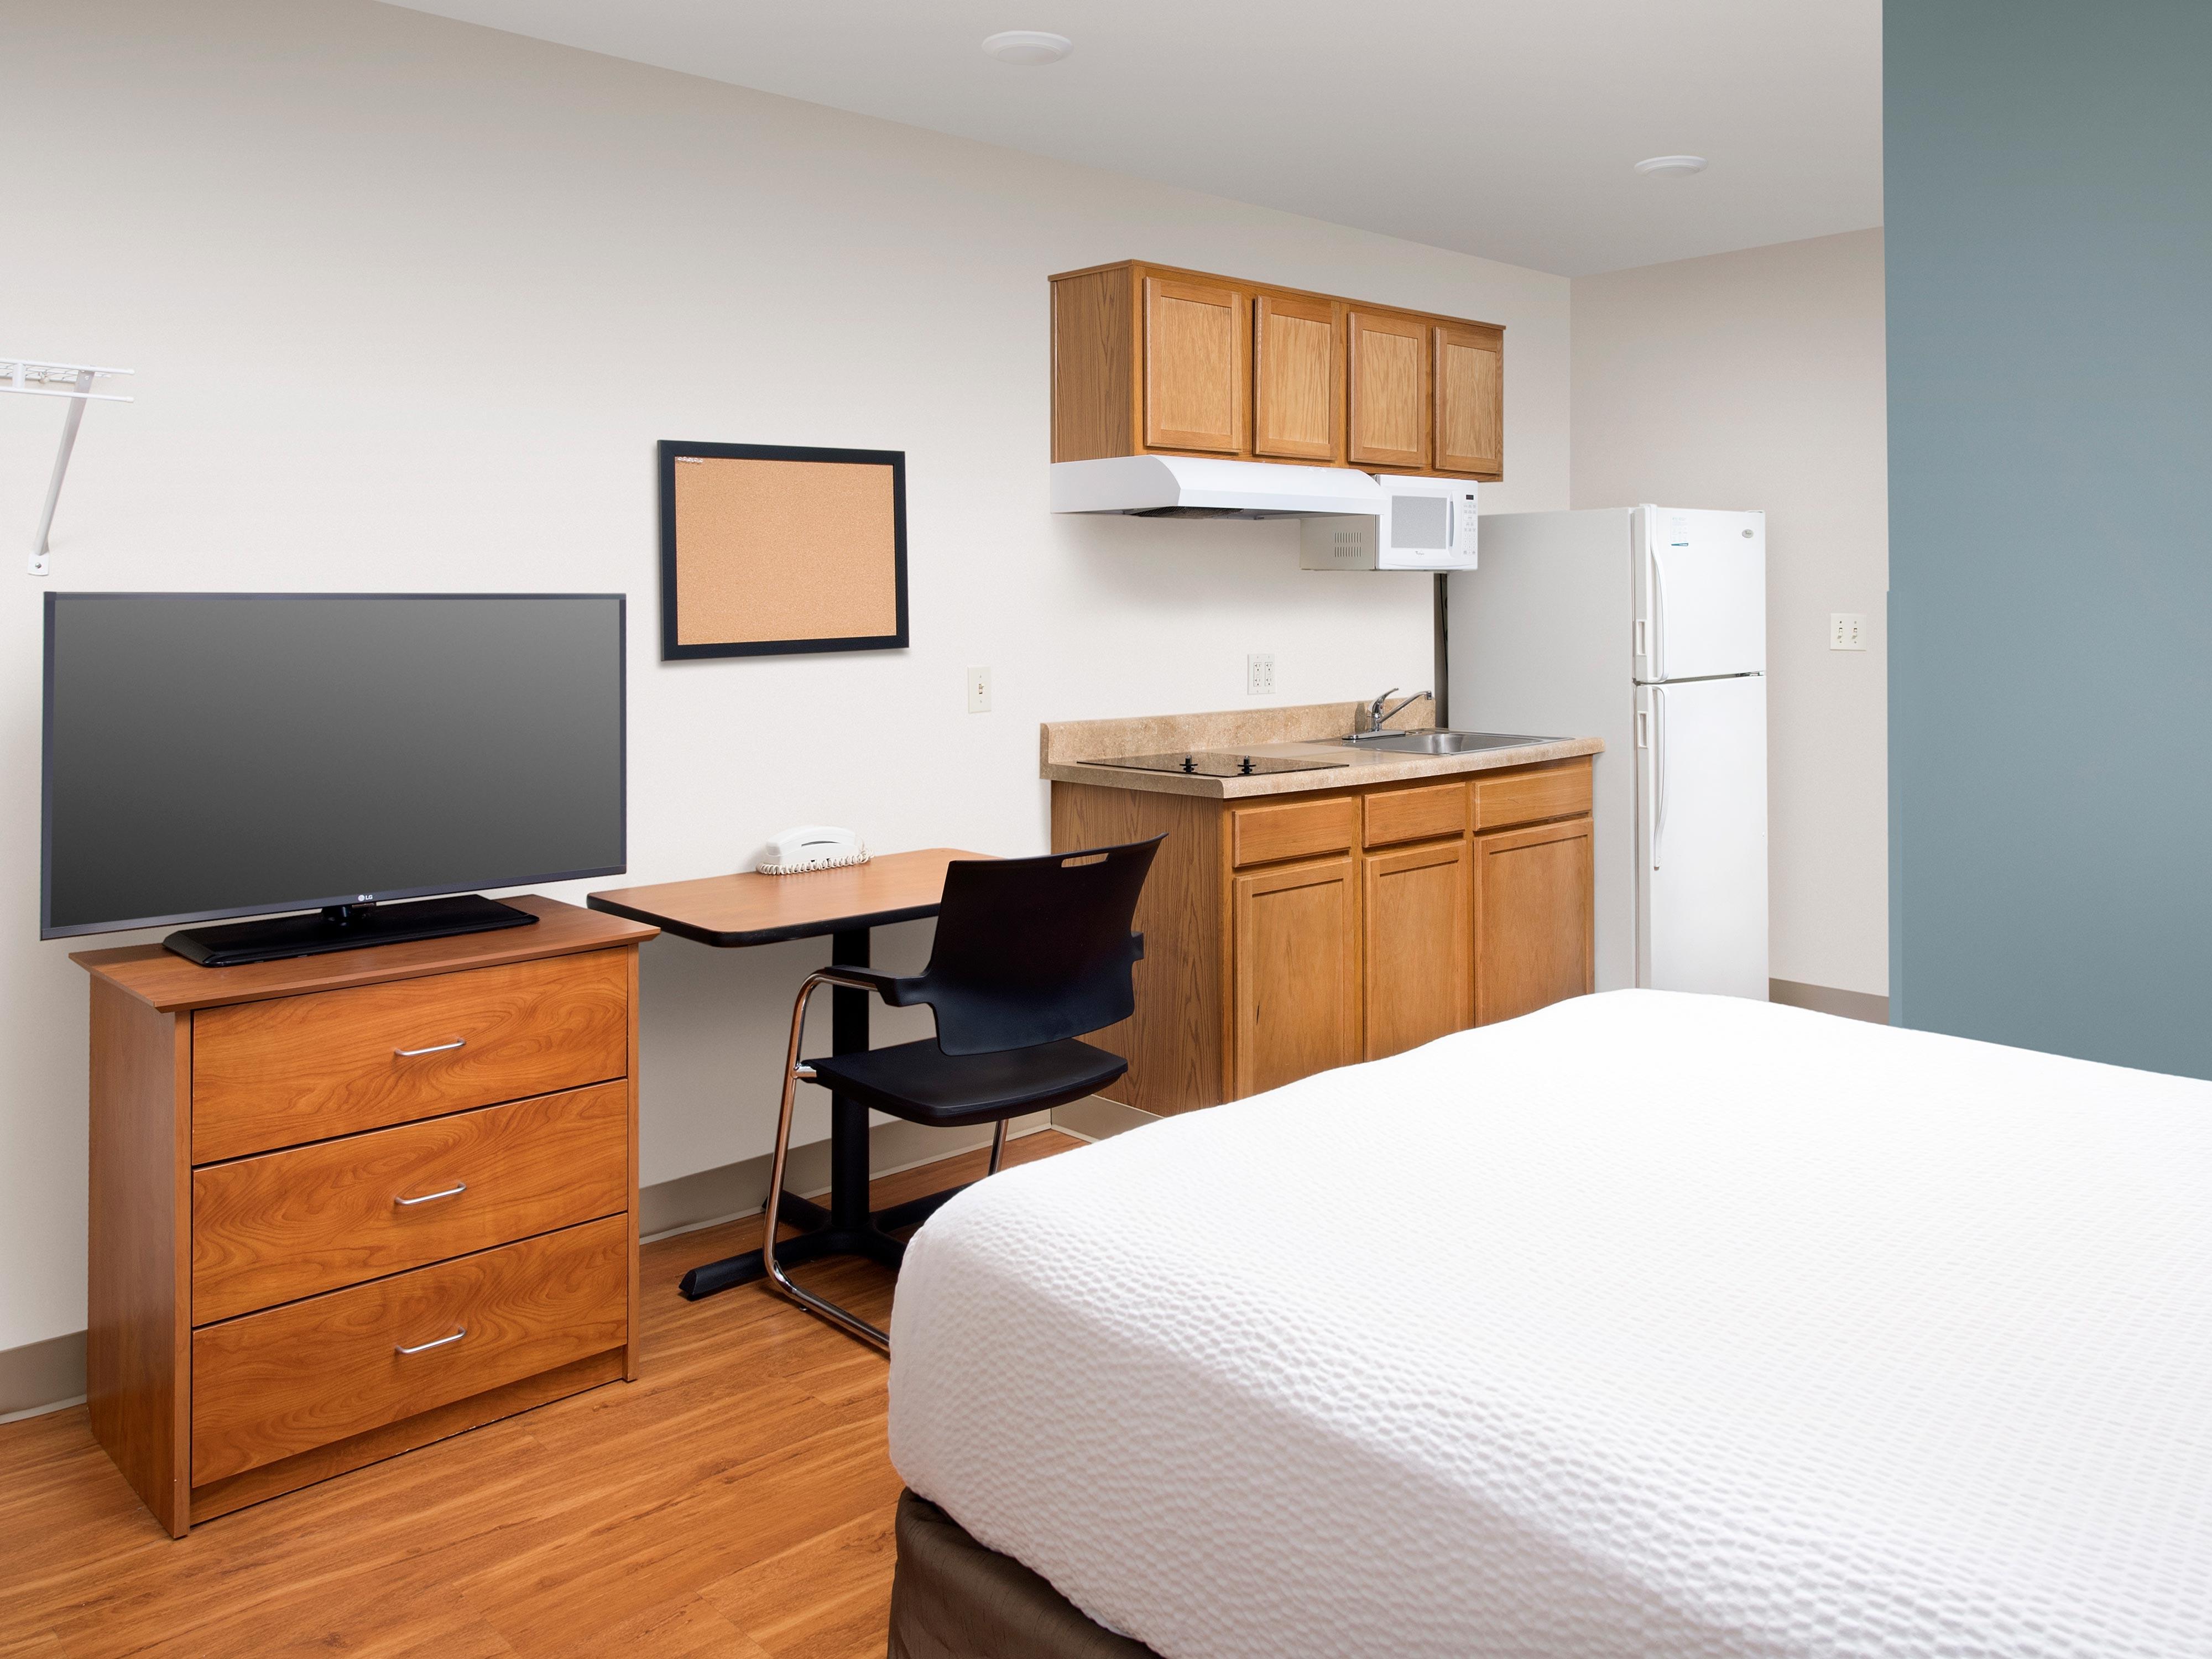 WoodSpring Suites Pensacola Northeast image 23